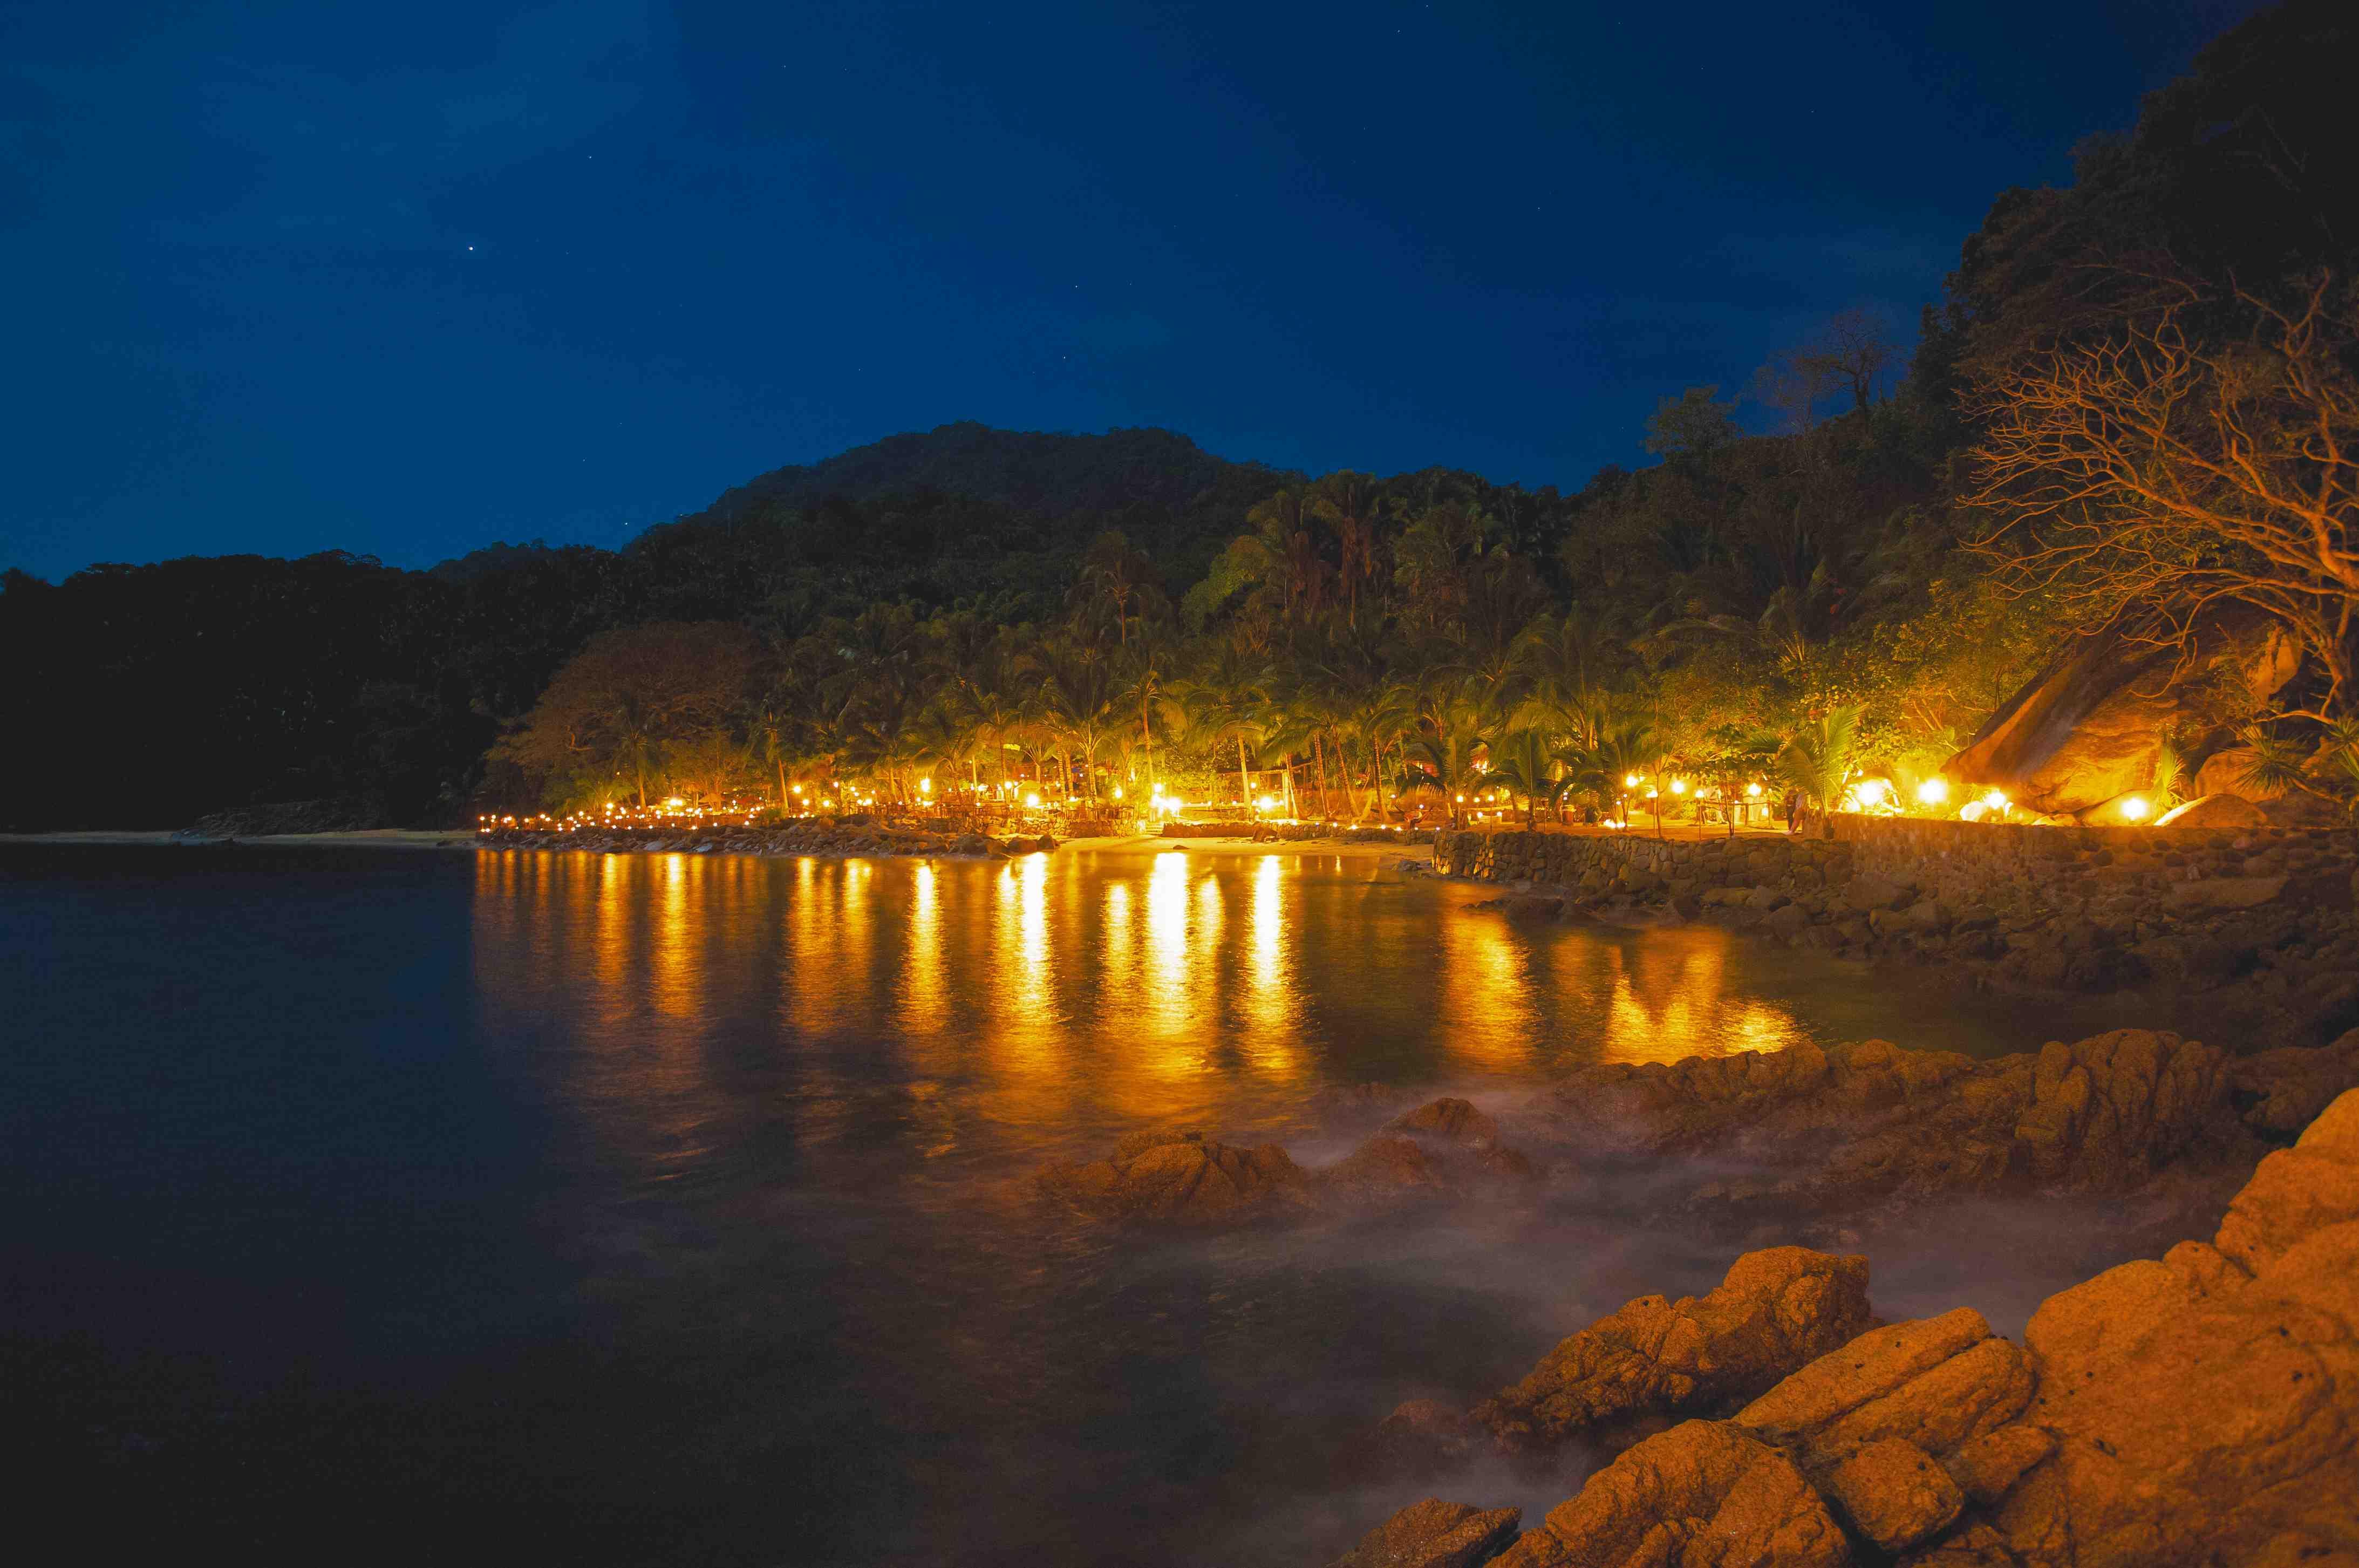 Rhythms Of The Night Vip - Last Minute Tours in Puerto Vallarta